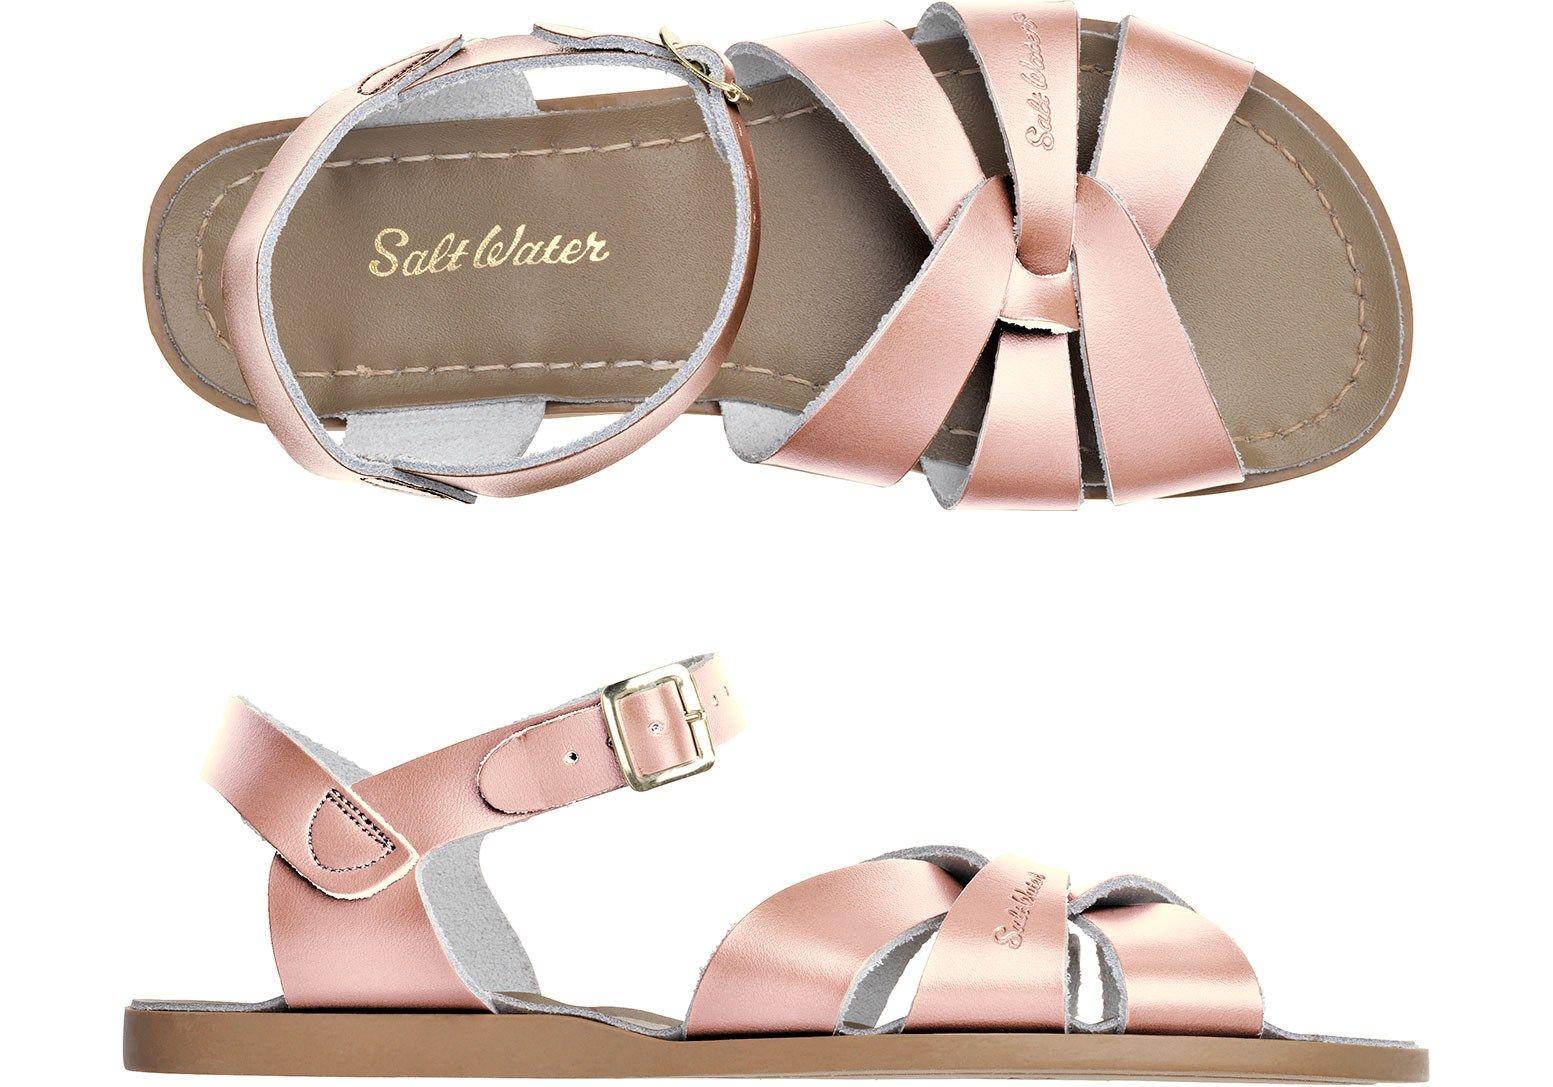 Saltwater women/'s floral sandals size 9